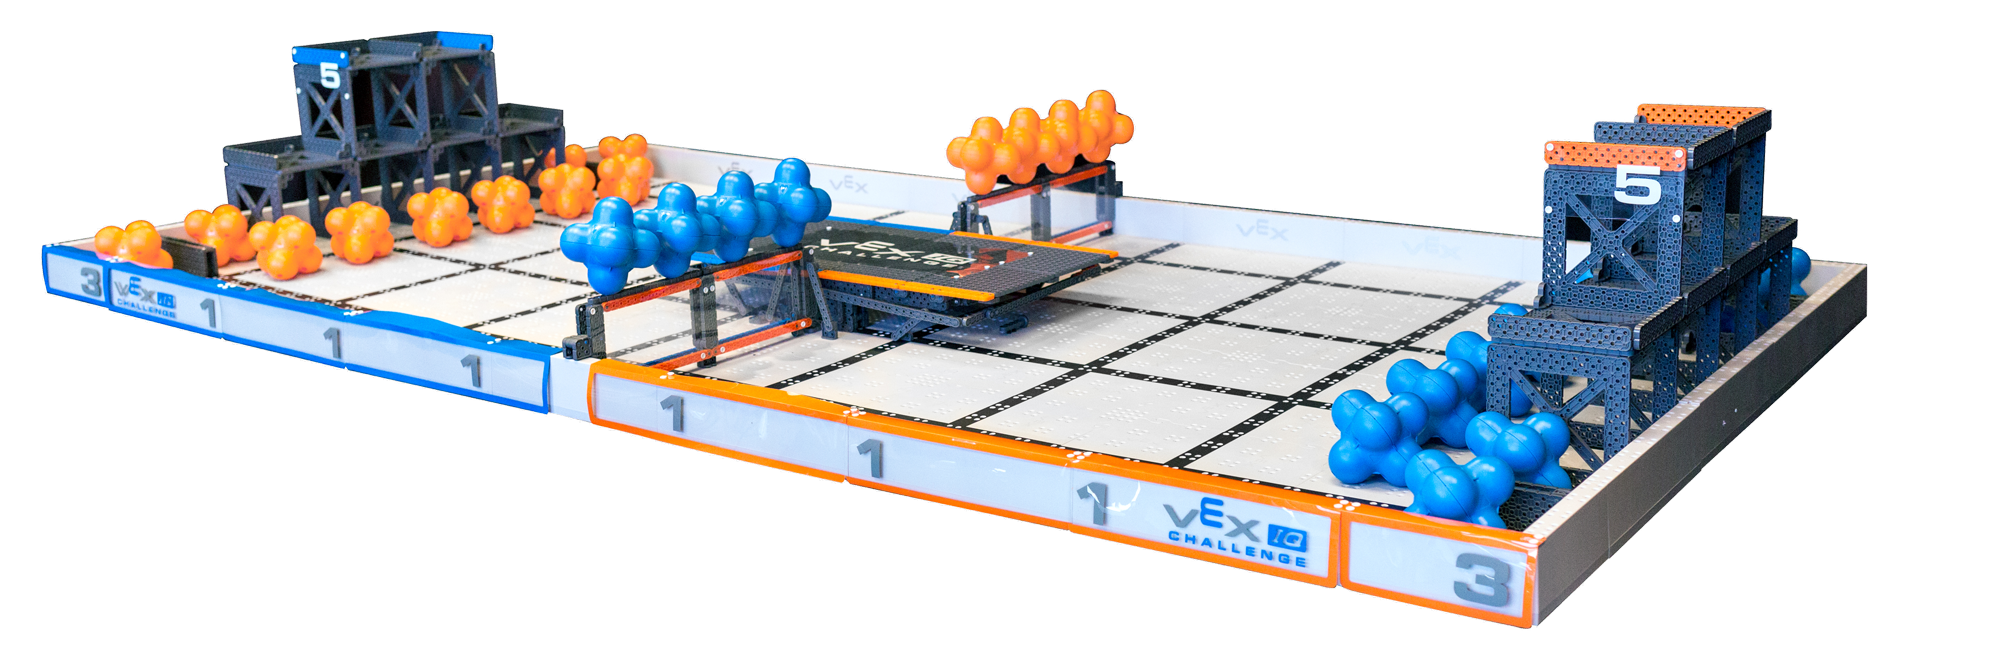 Vex Iq Crossover Season Barcbots